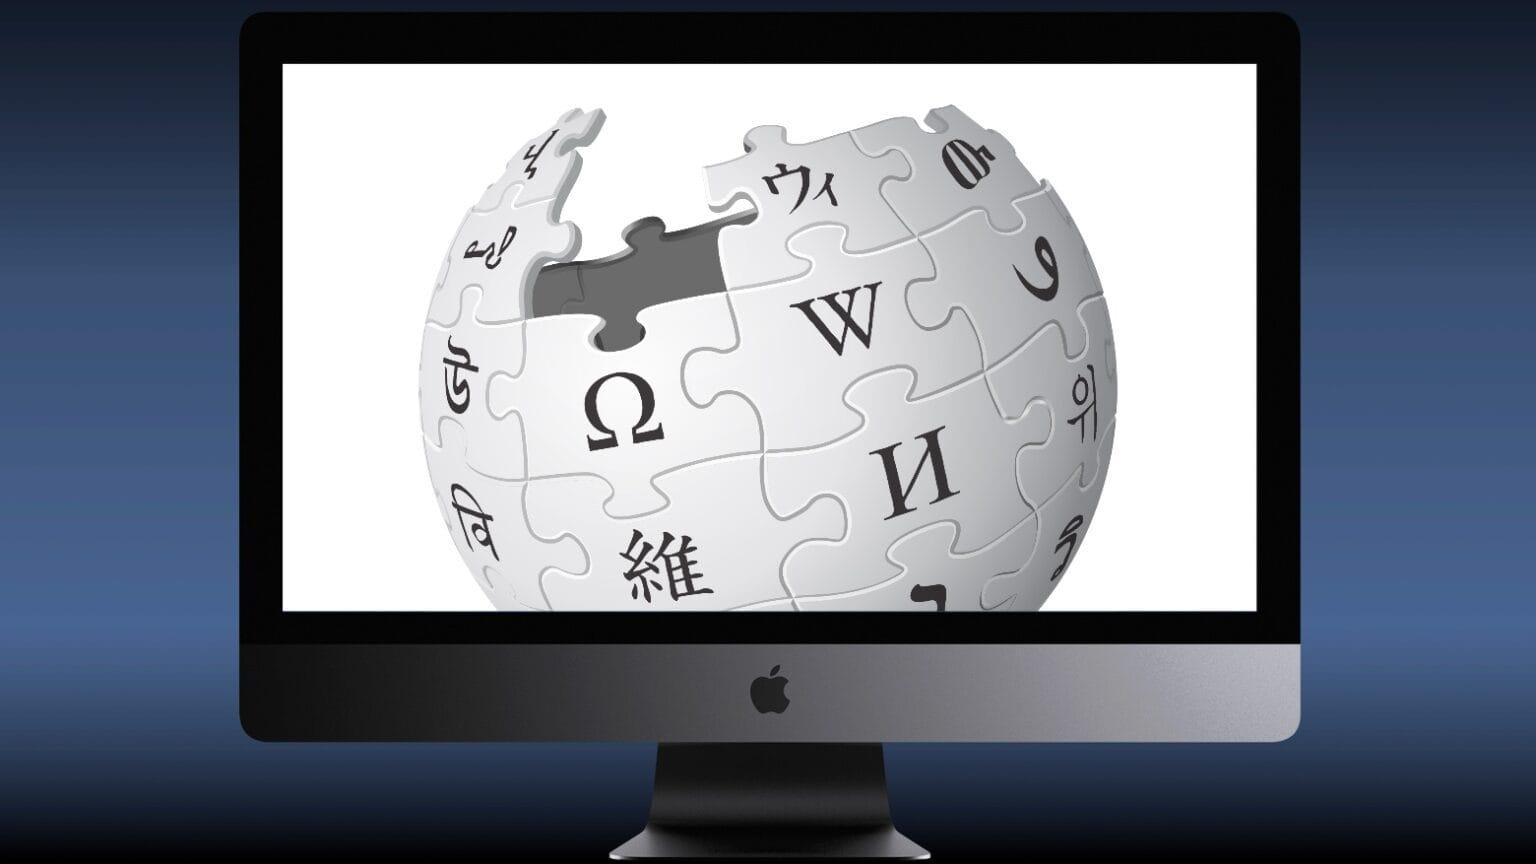 Apple depends on Wikipedia